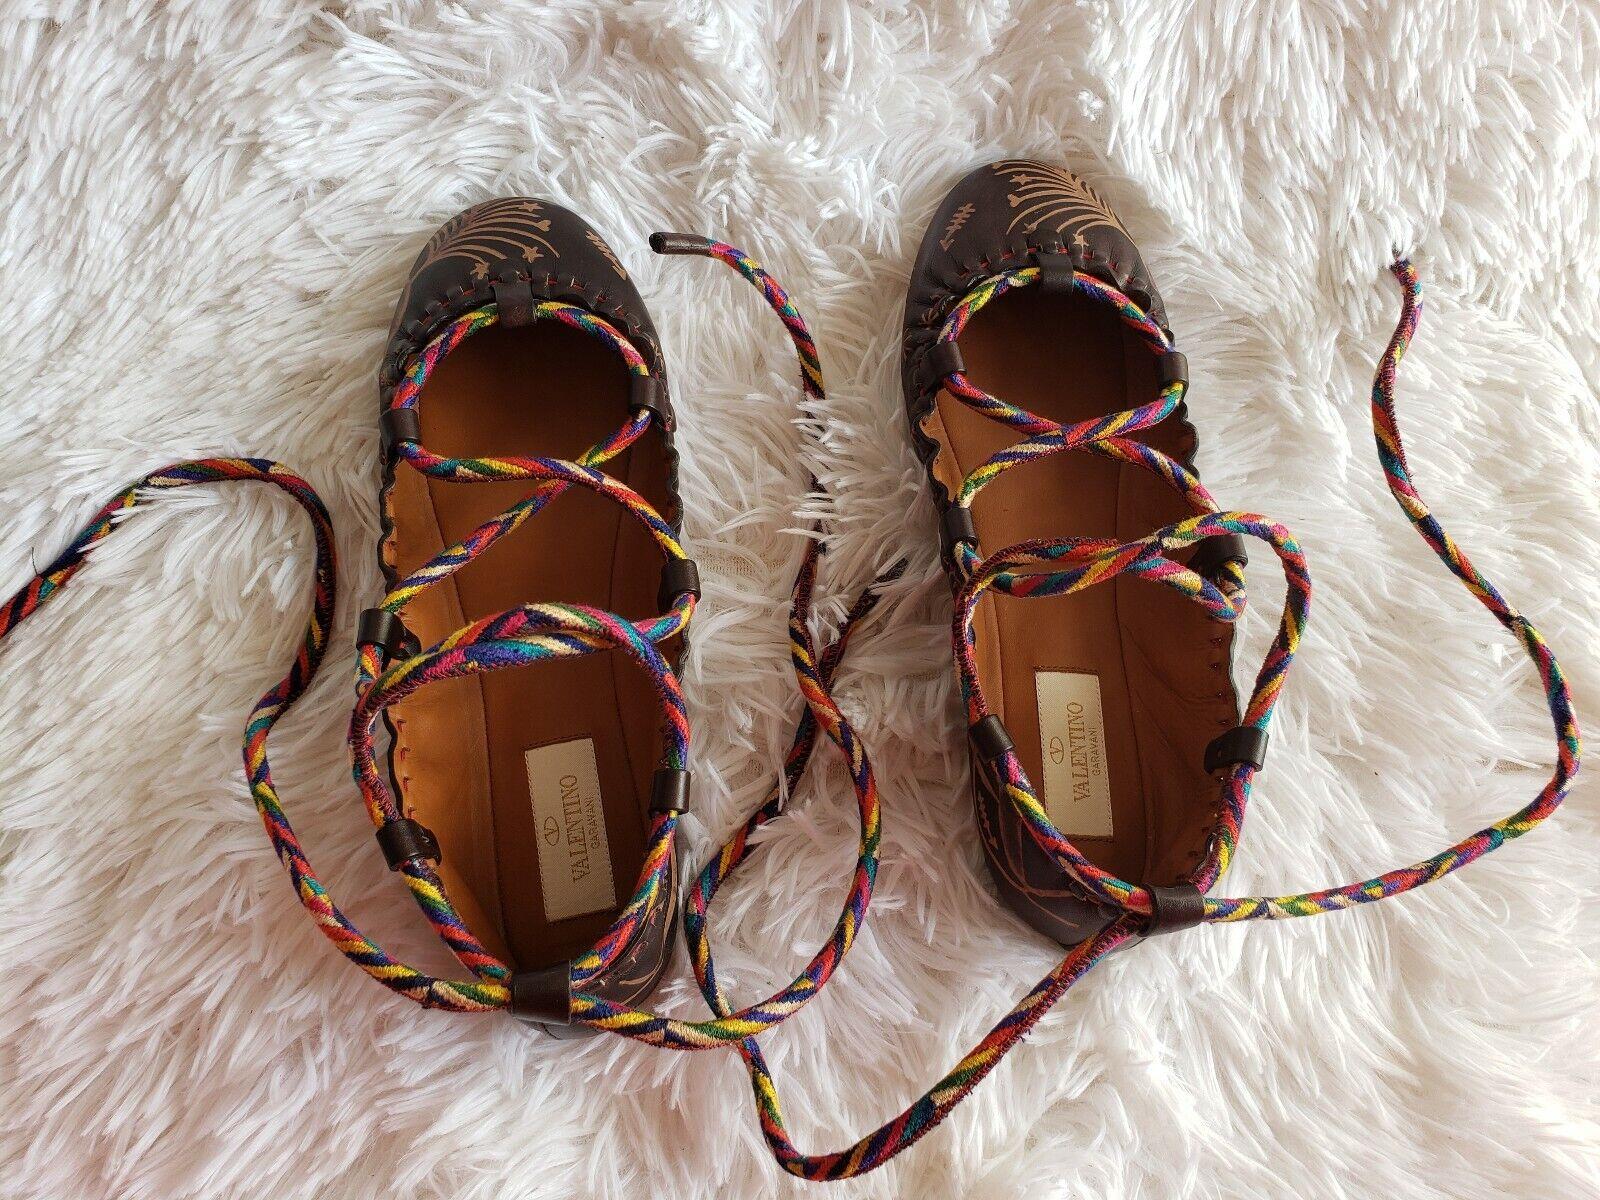 Nwob Valentino kalavani zapatillas de ballet marrón oscuro (37)